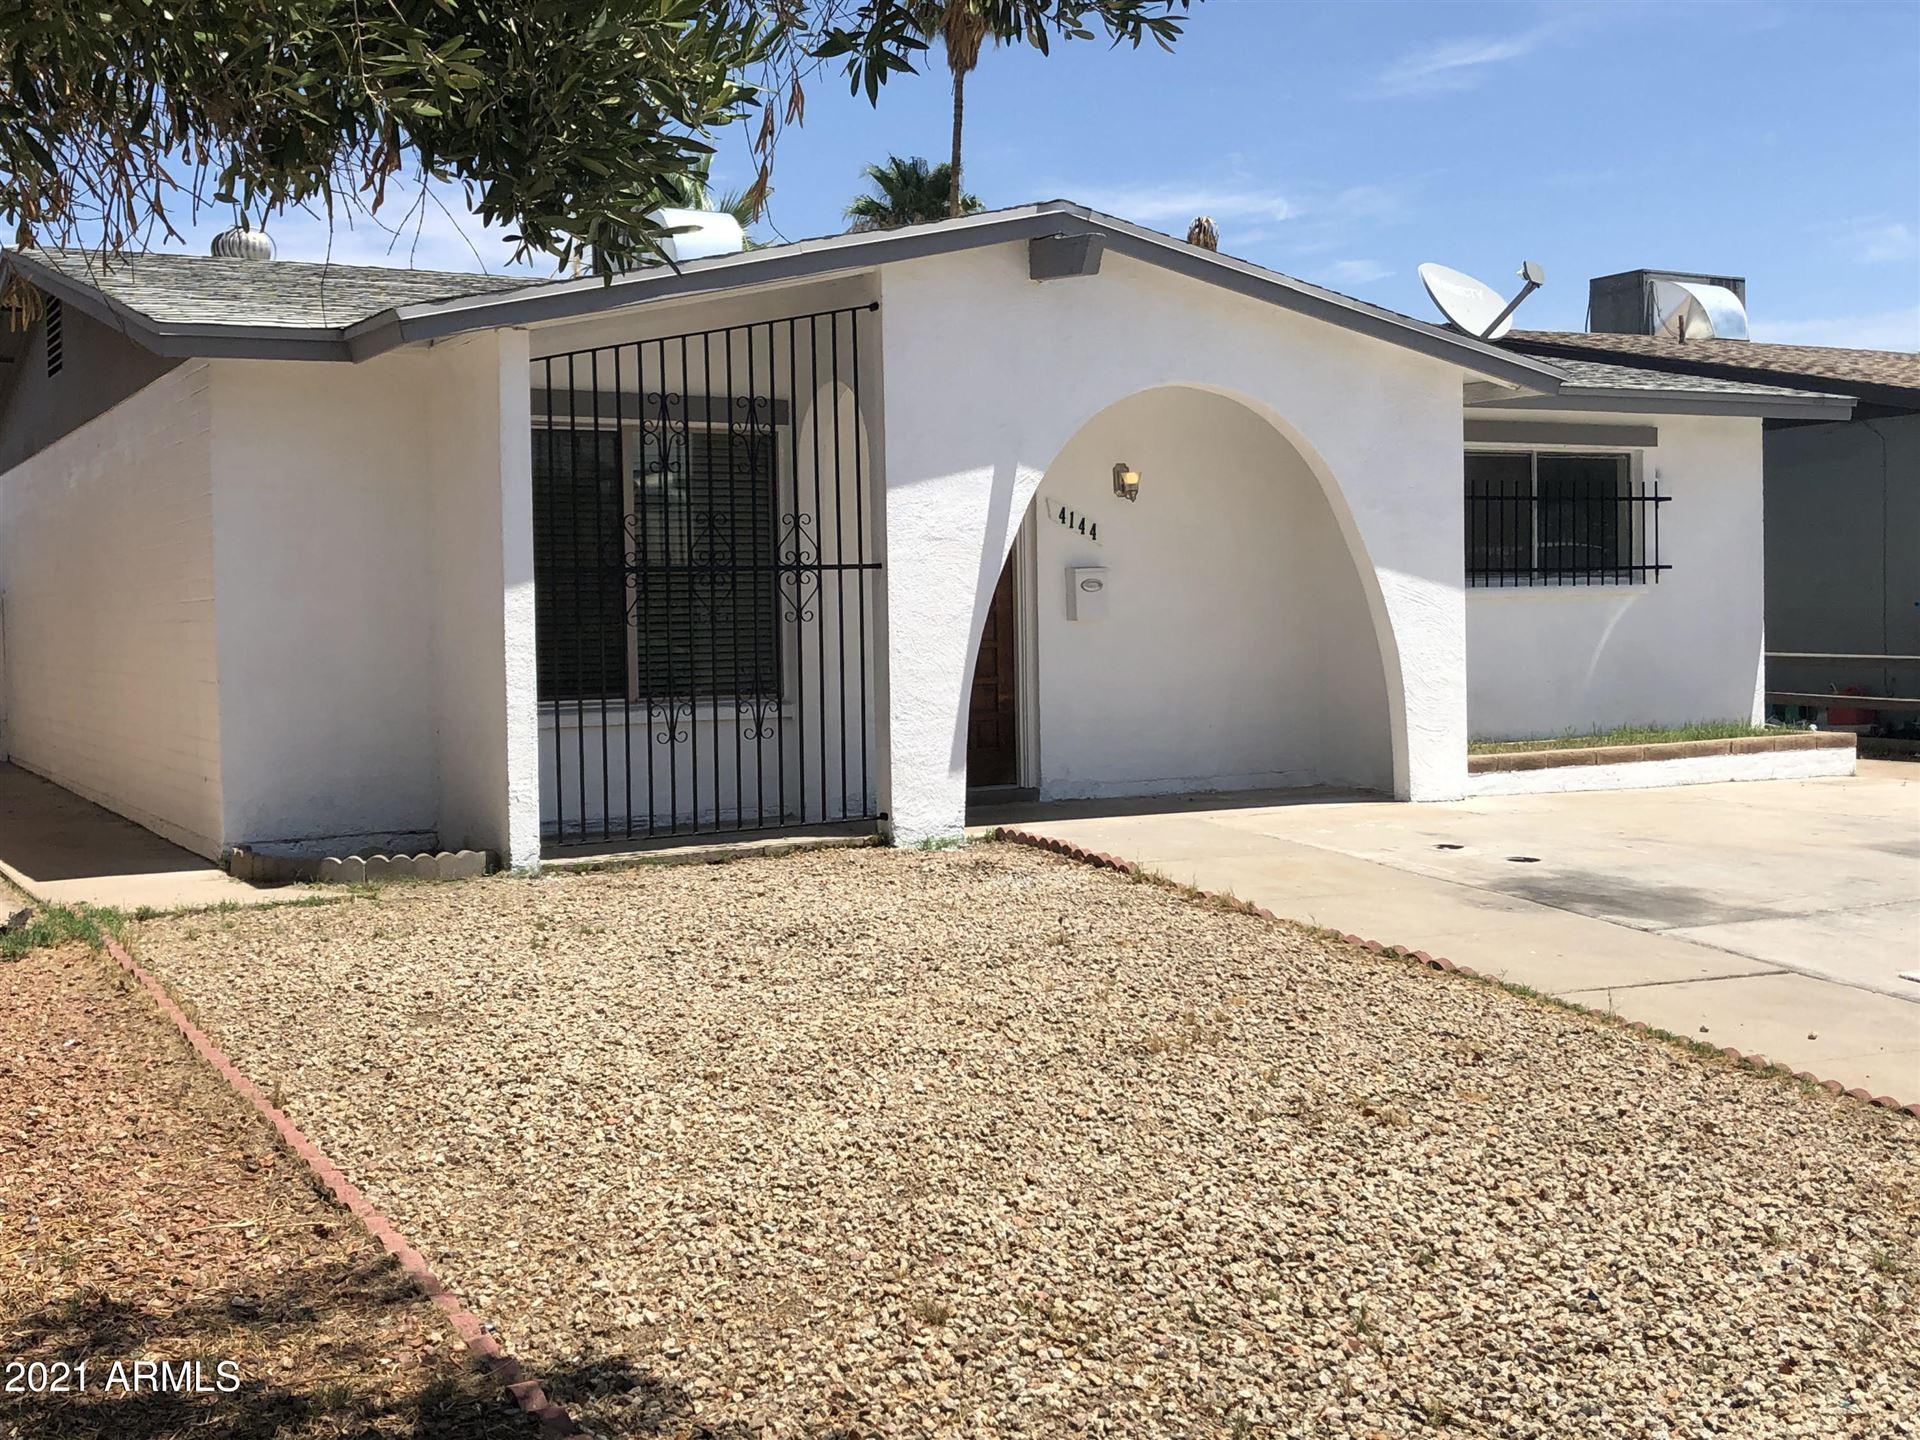 4144 W MEDLOCK Drive, Phoenix, AZ 85019 - MLS#: 6268746